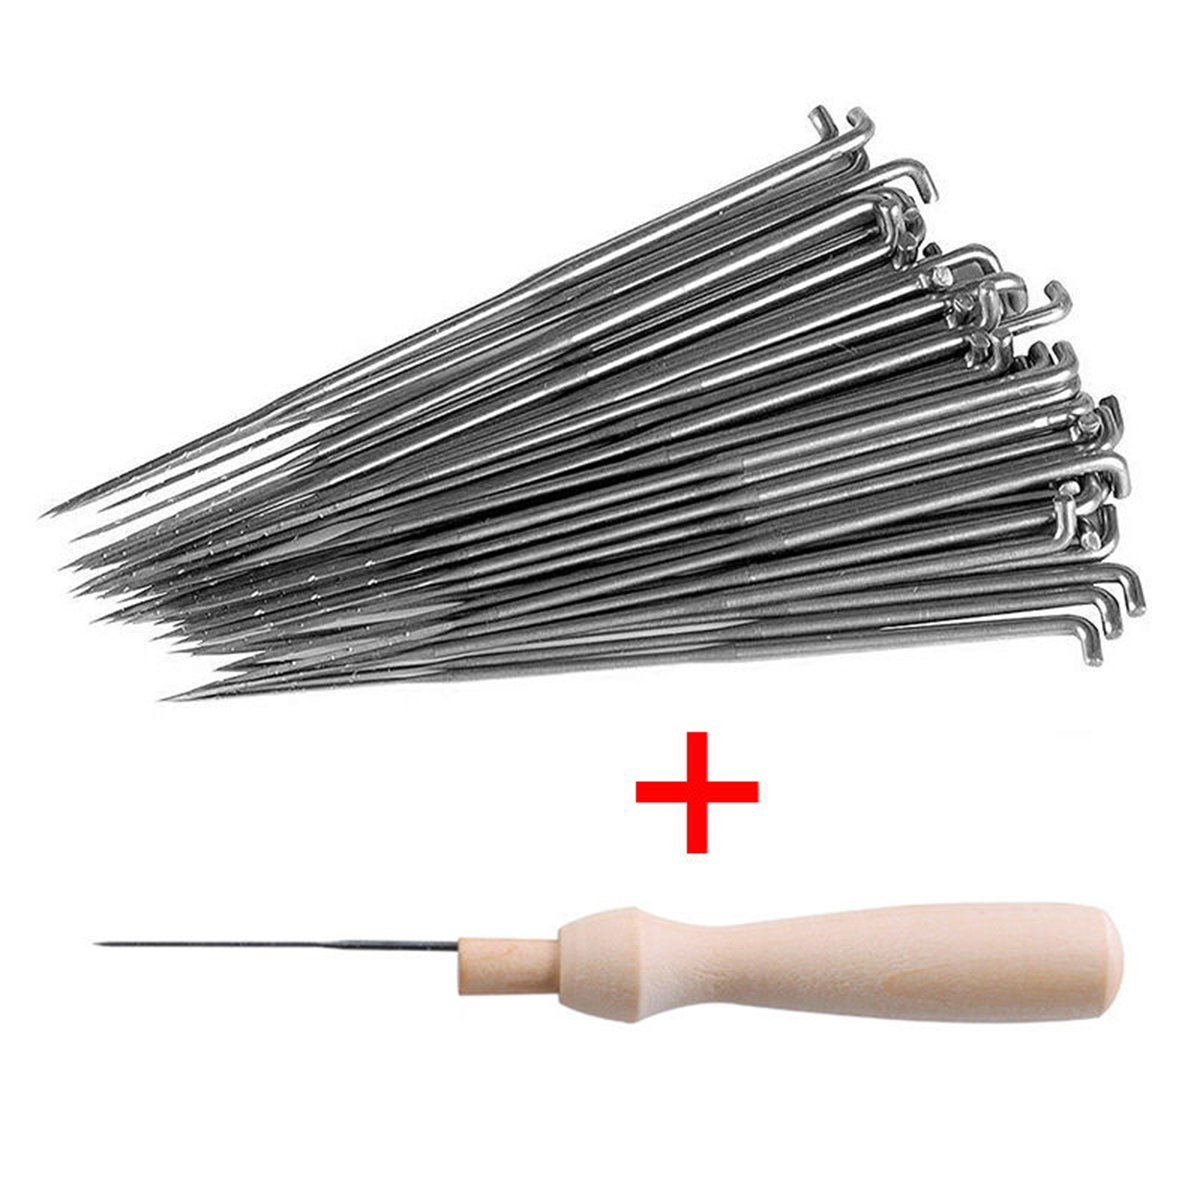 60pcs Felting Needles of 3 Sizes + 1 pc Handle Wood Felt Tool PDTO